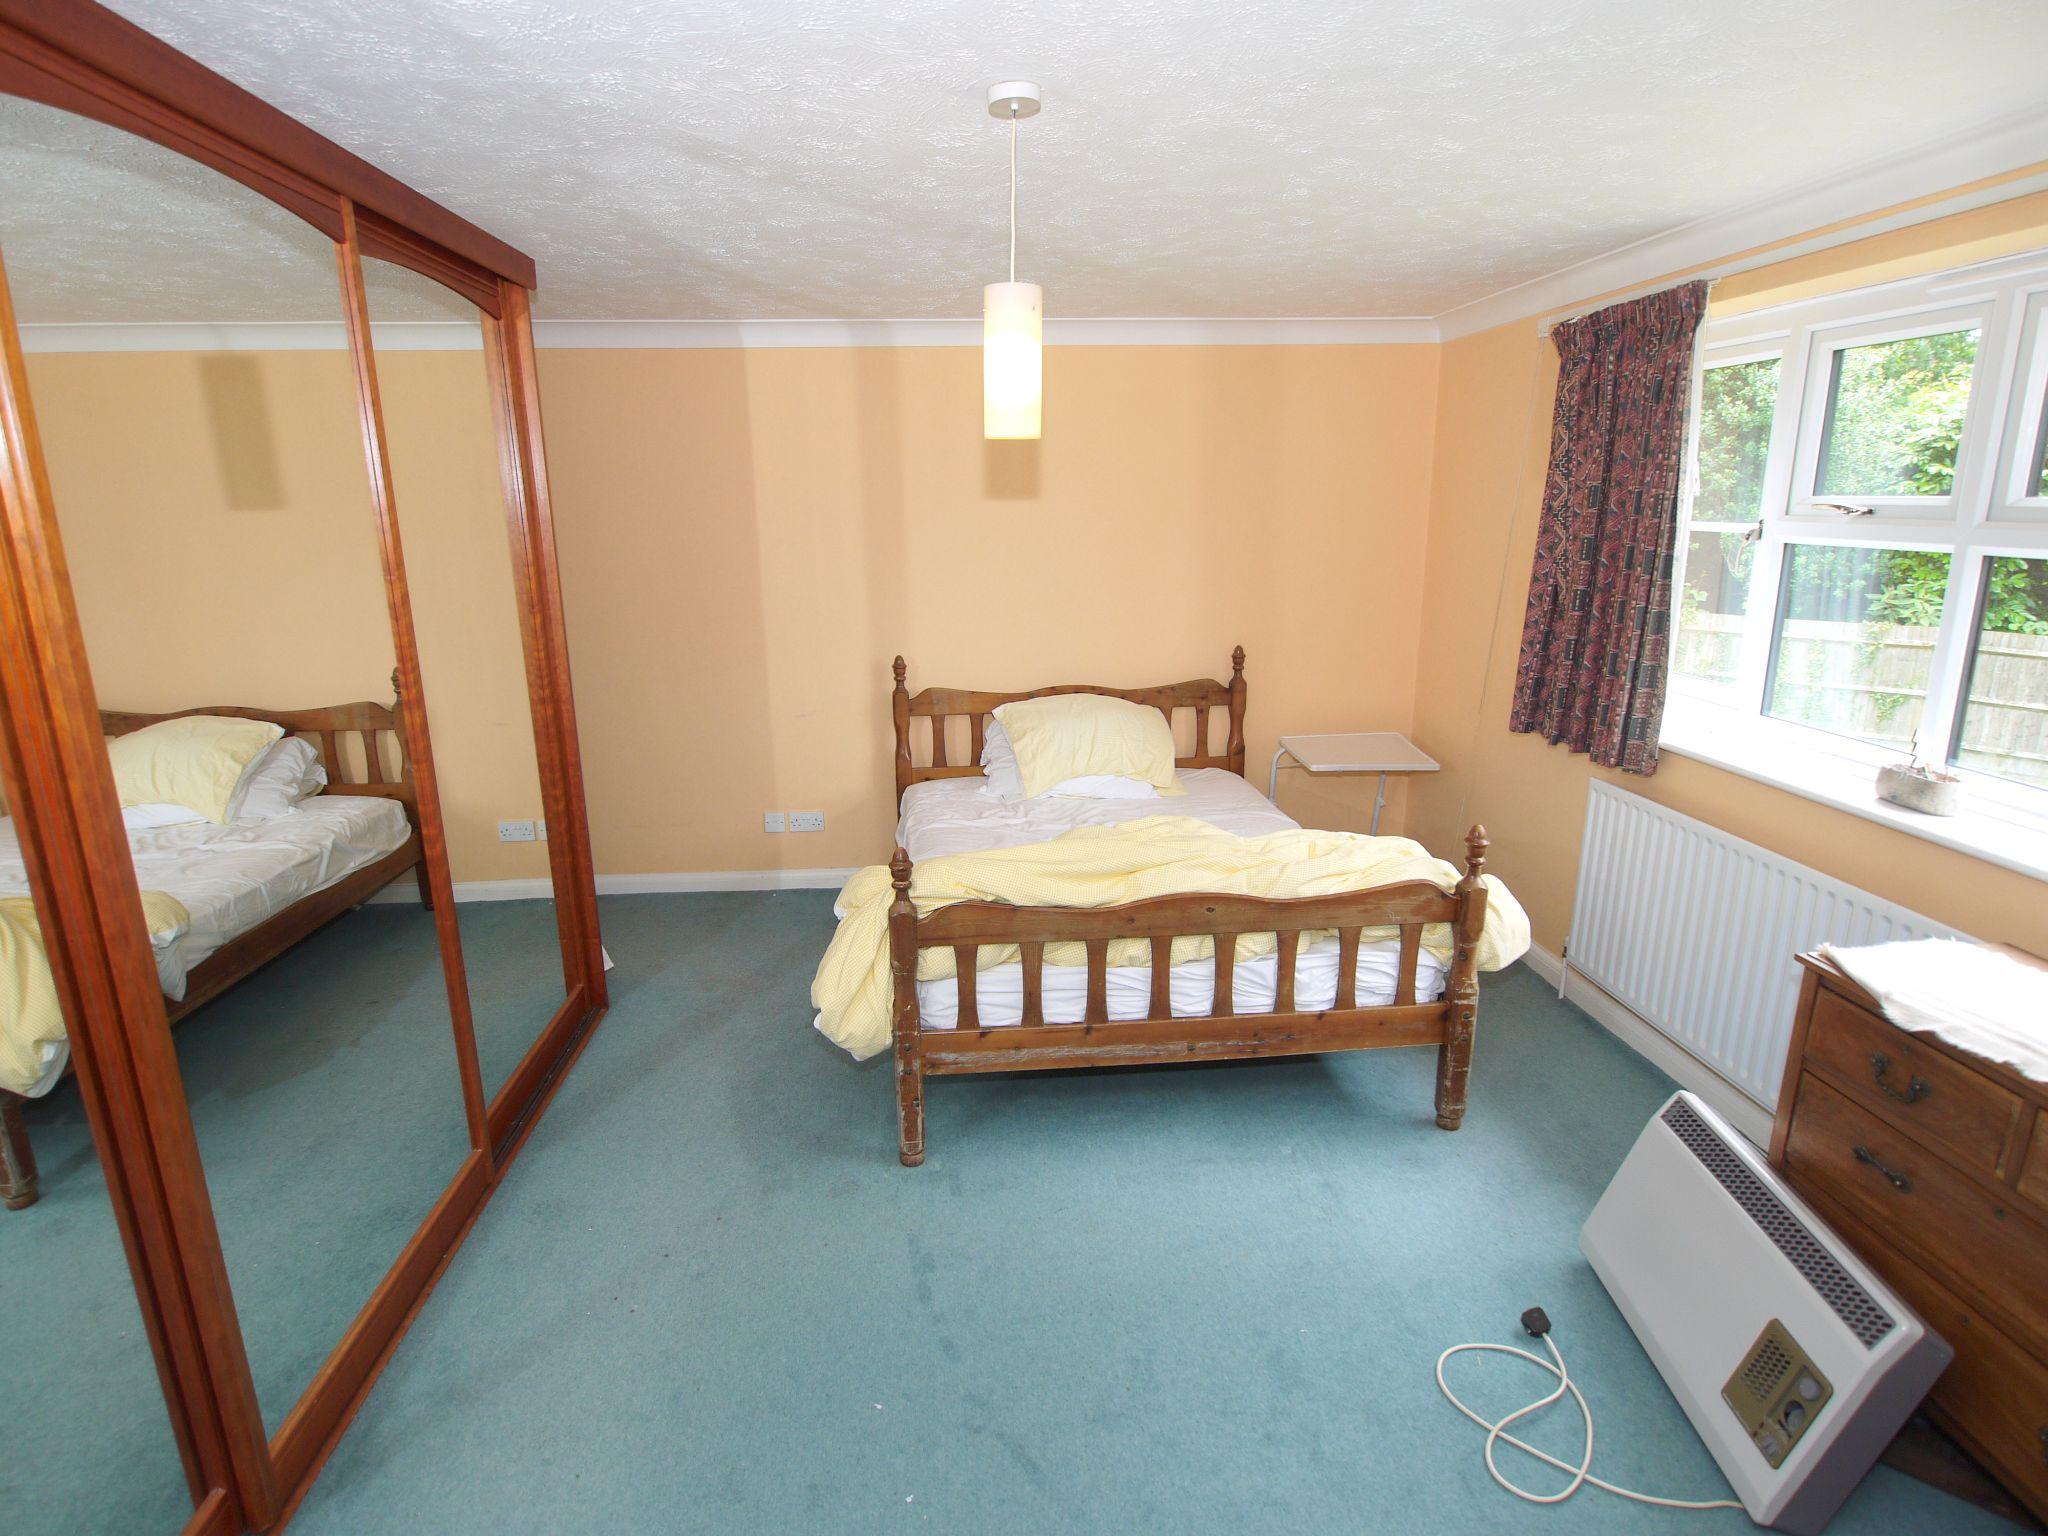 2 bedroom apartment For Sale in Sevenoaks - Photograph 3